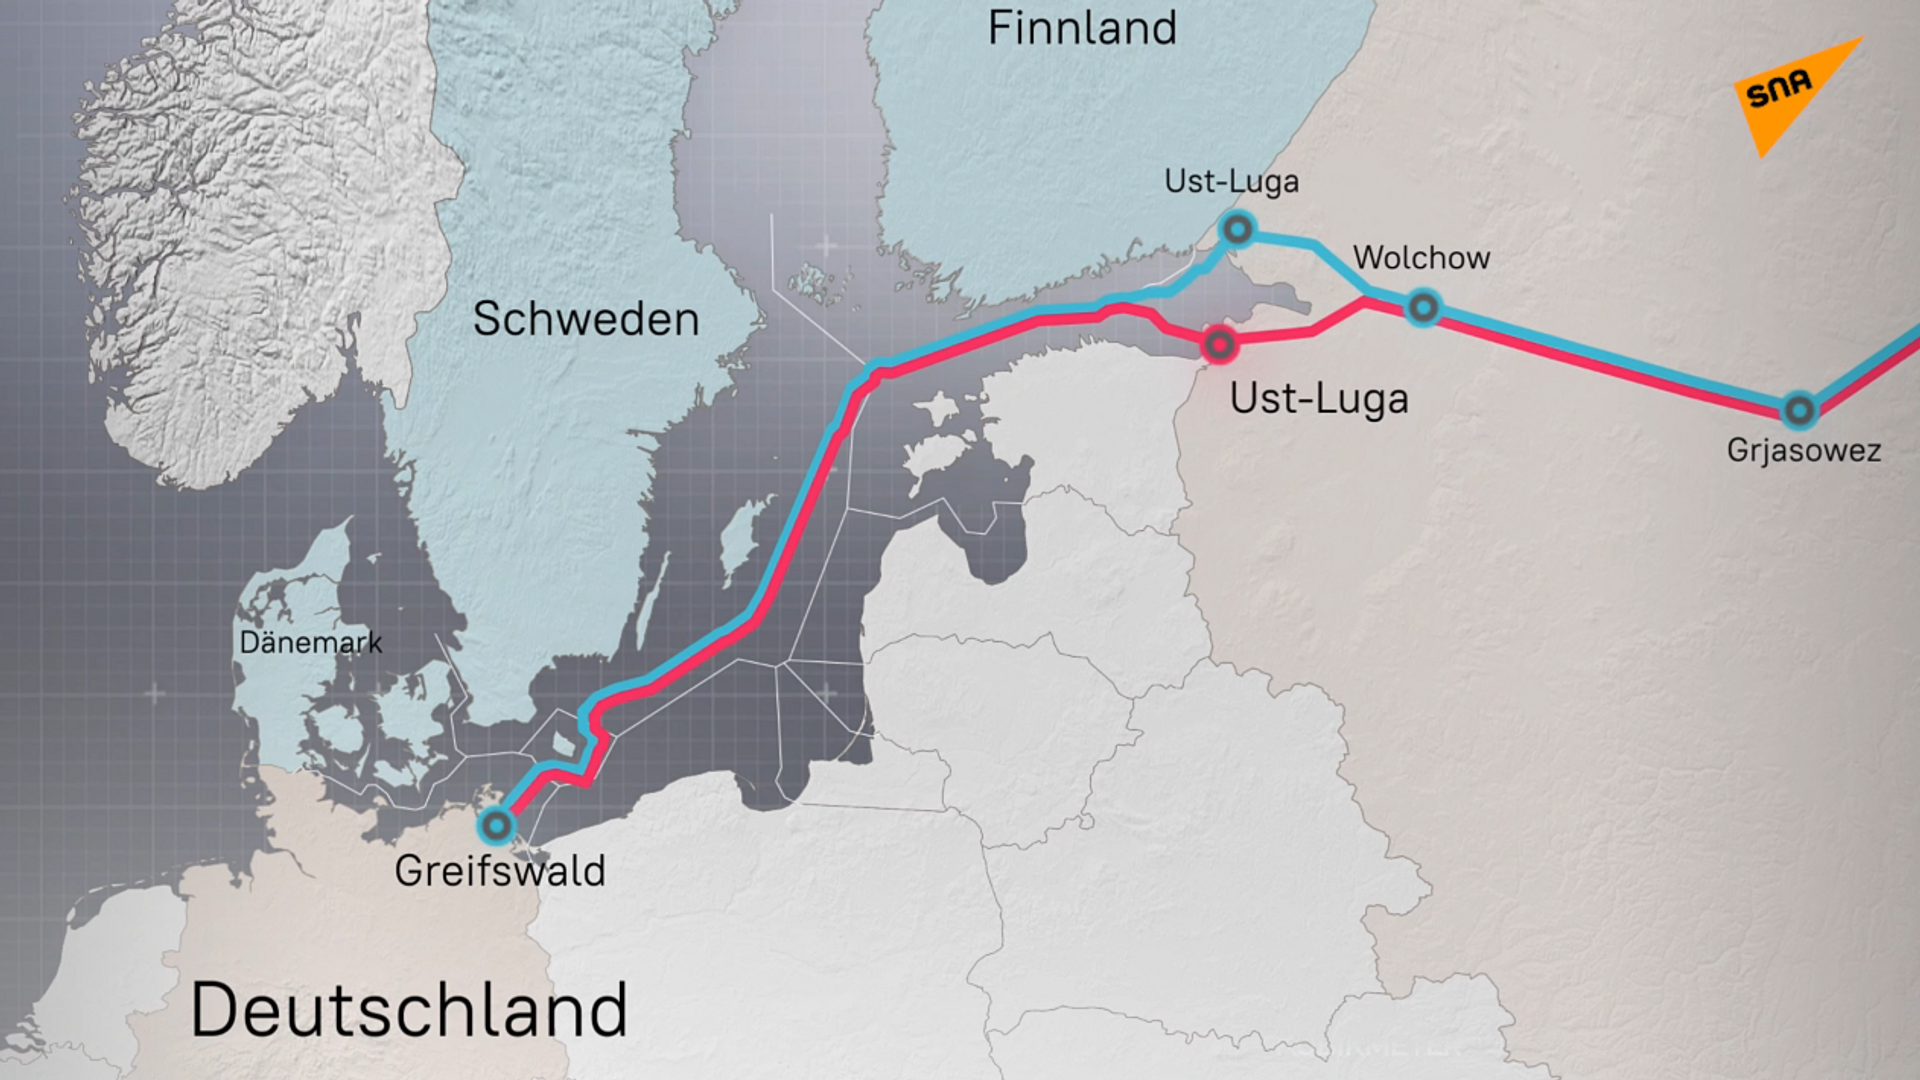 Gaspipeline Nord Stream 2: Rückblick auf den Bau unter Sanktionsregime - SNA, 1920, 06.10.2021